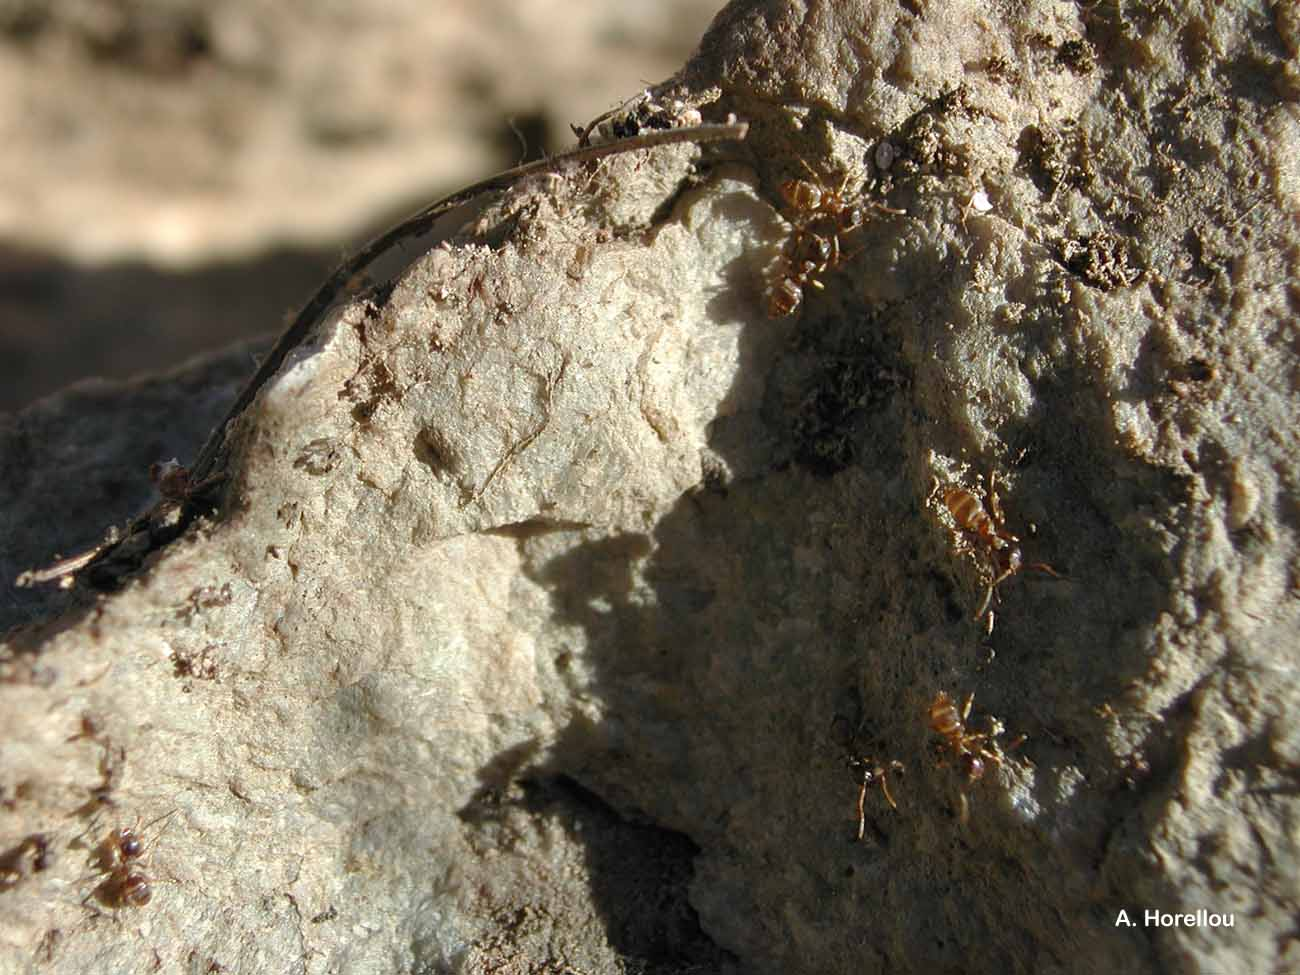 Myrmica sabuleti